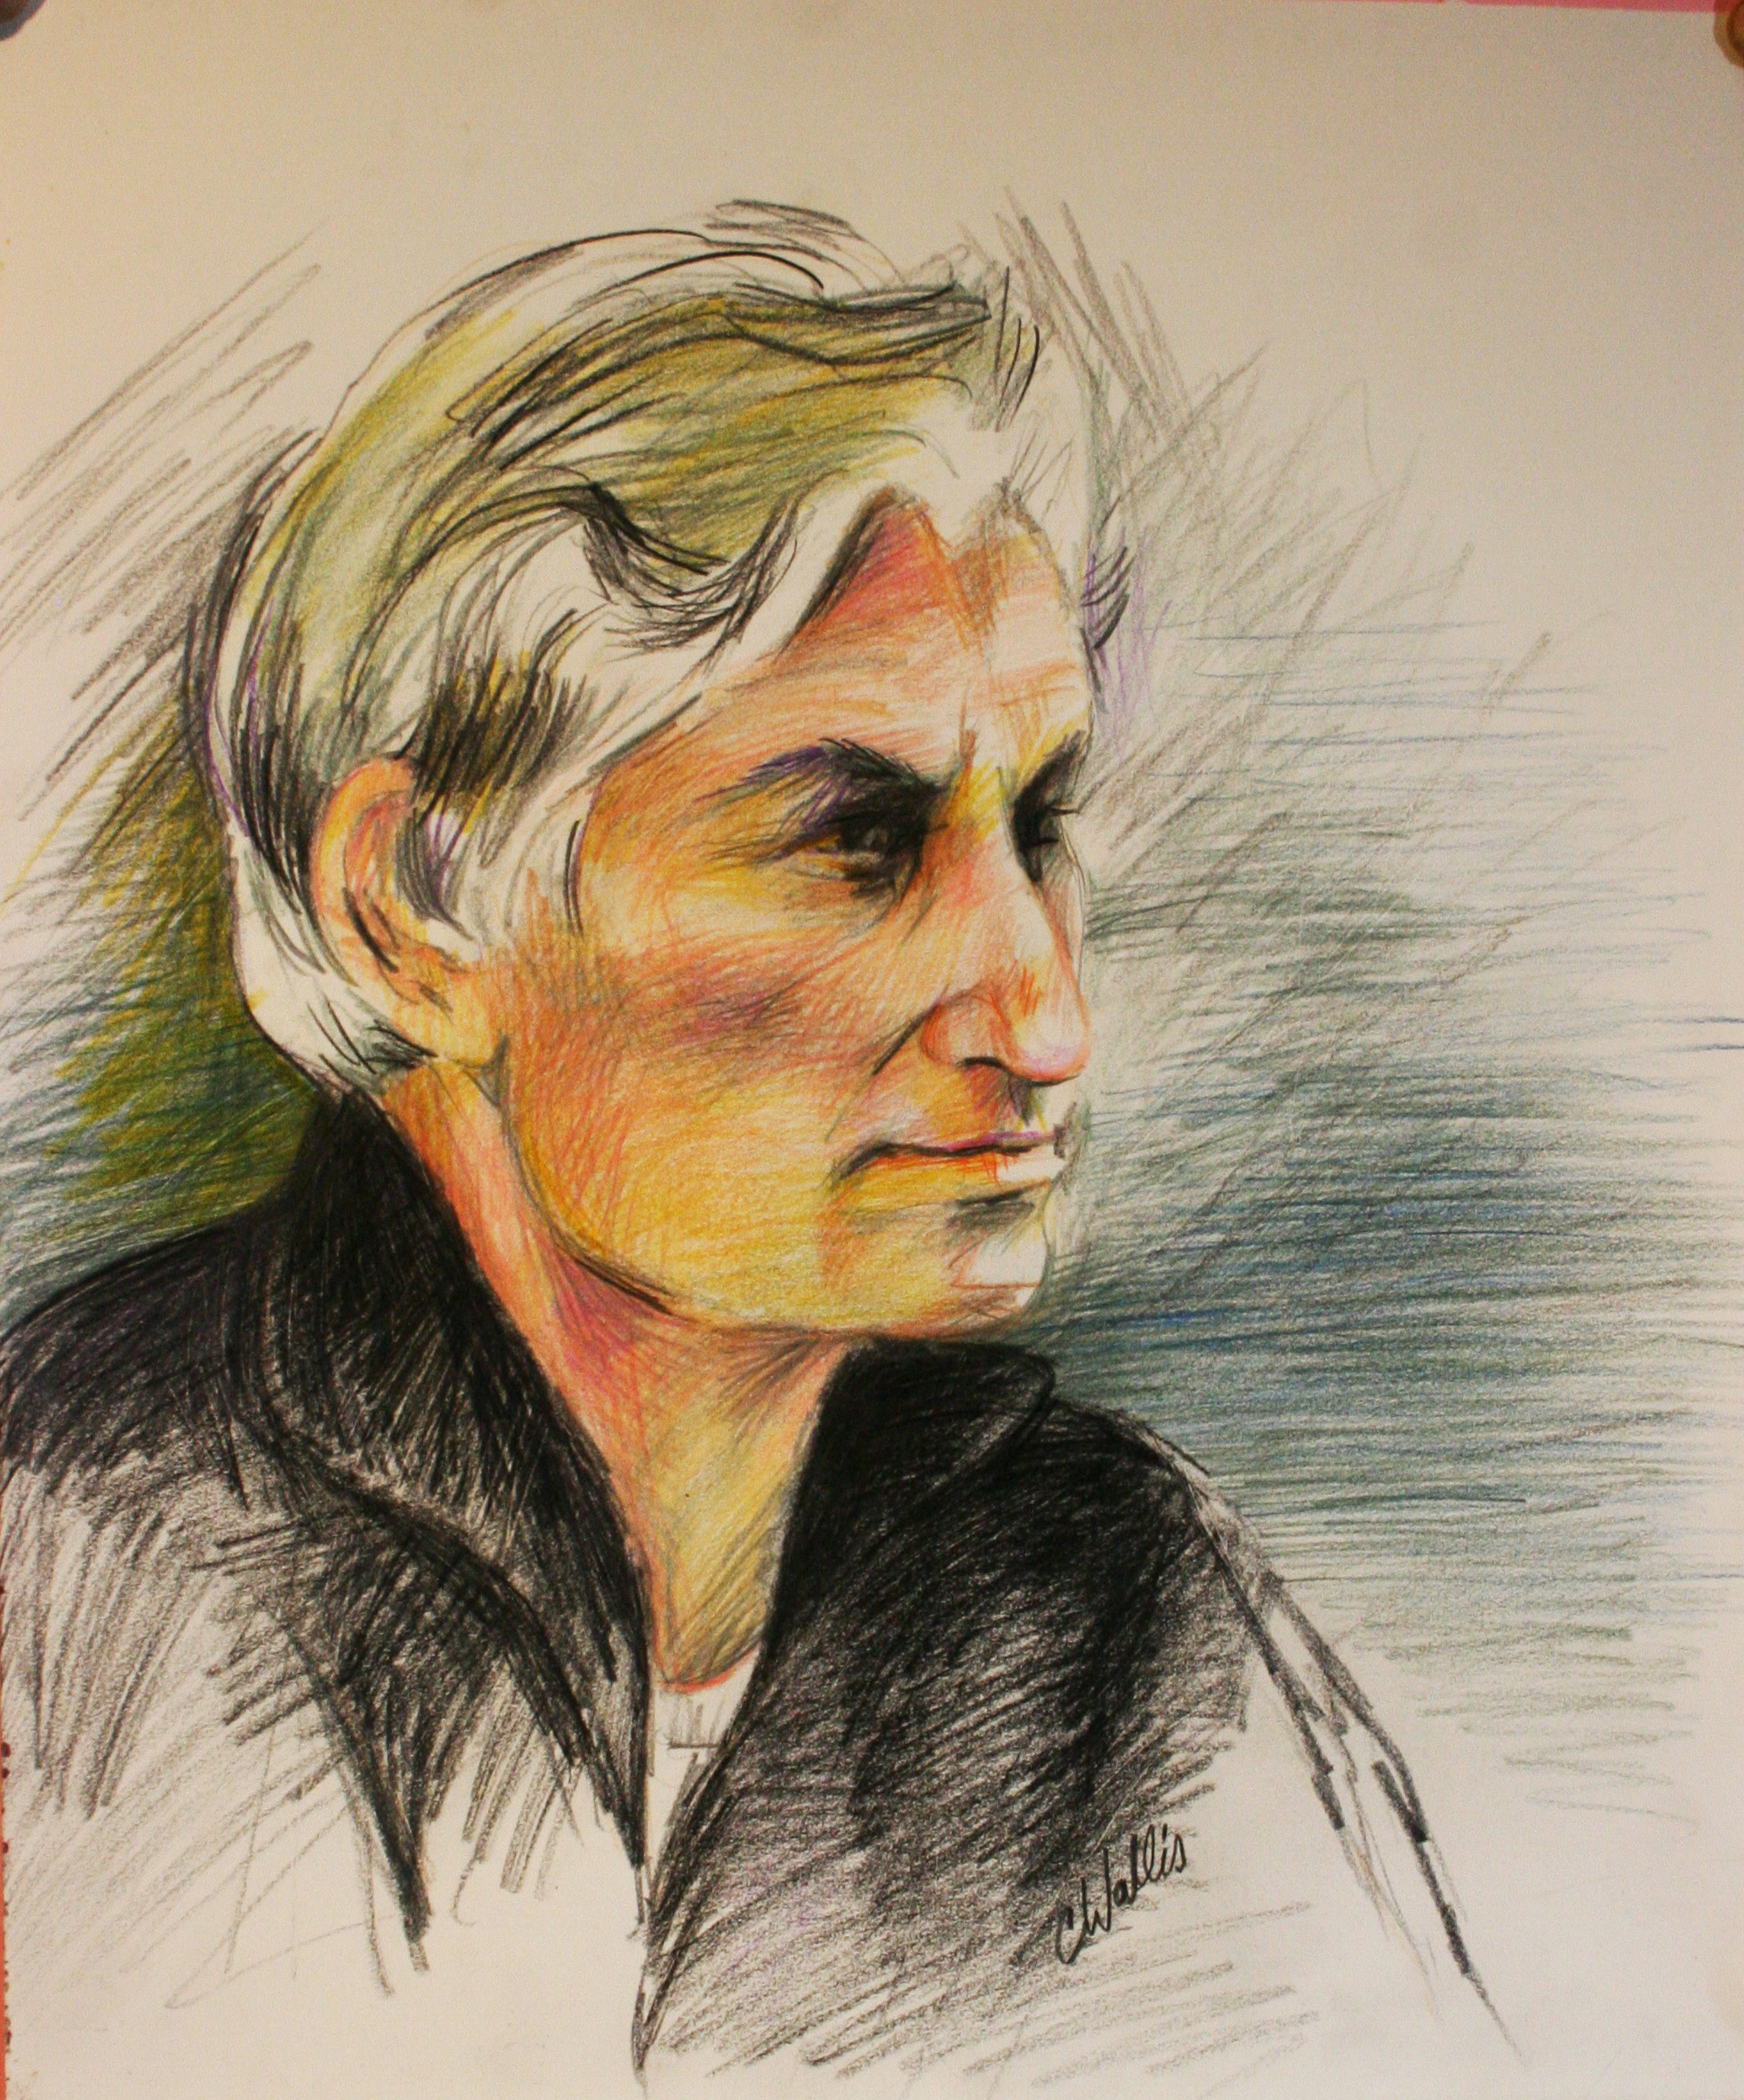 Christine Wallis did this drawing.